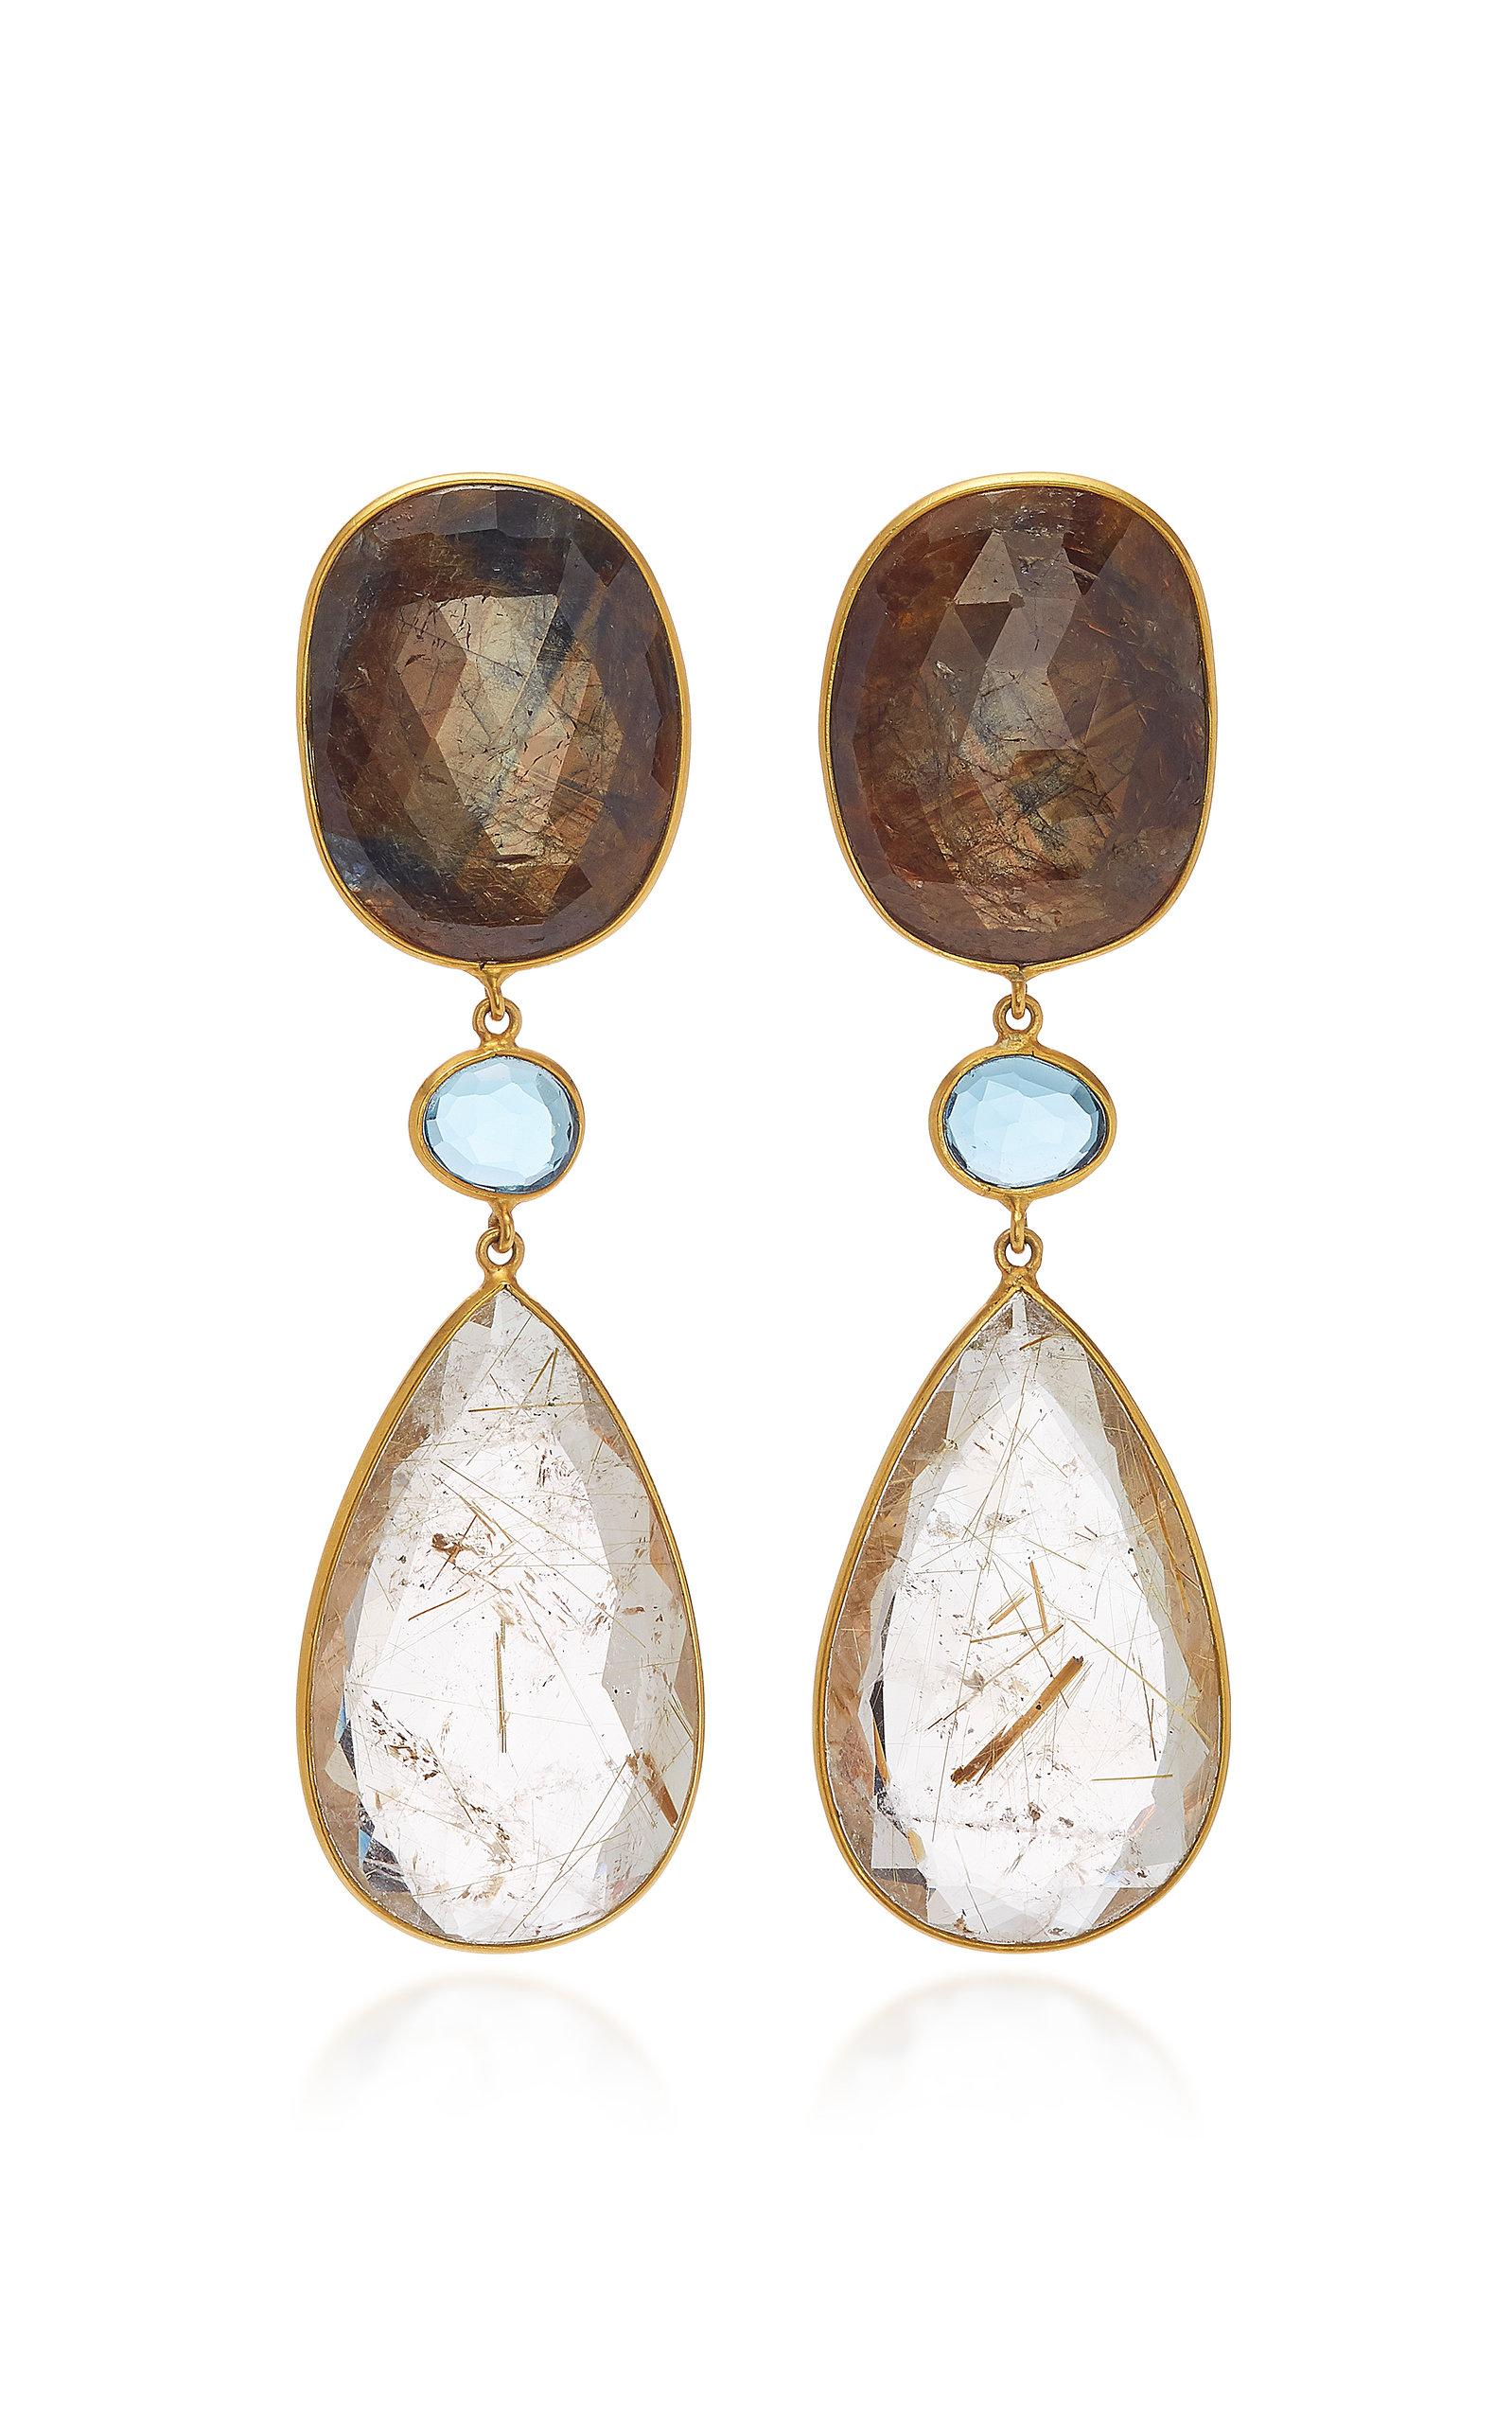 BAHINA 18K Gold Sapphire Topaz And Rutilated Quartz Earrings in Multi